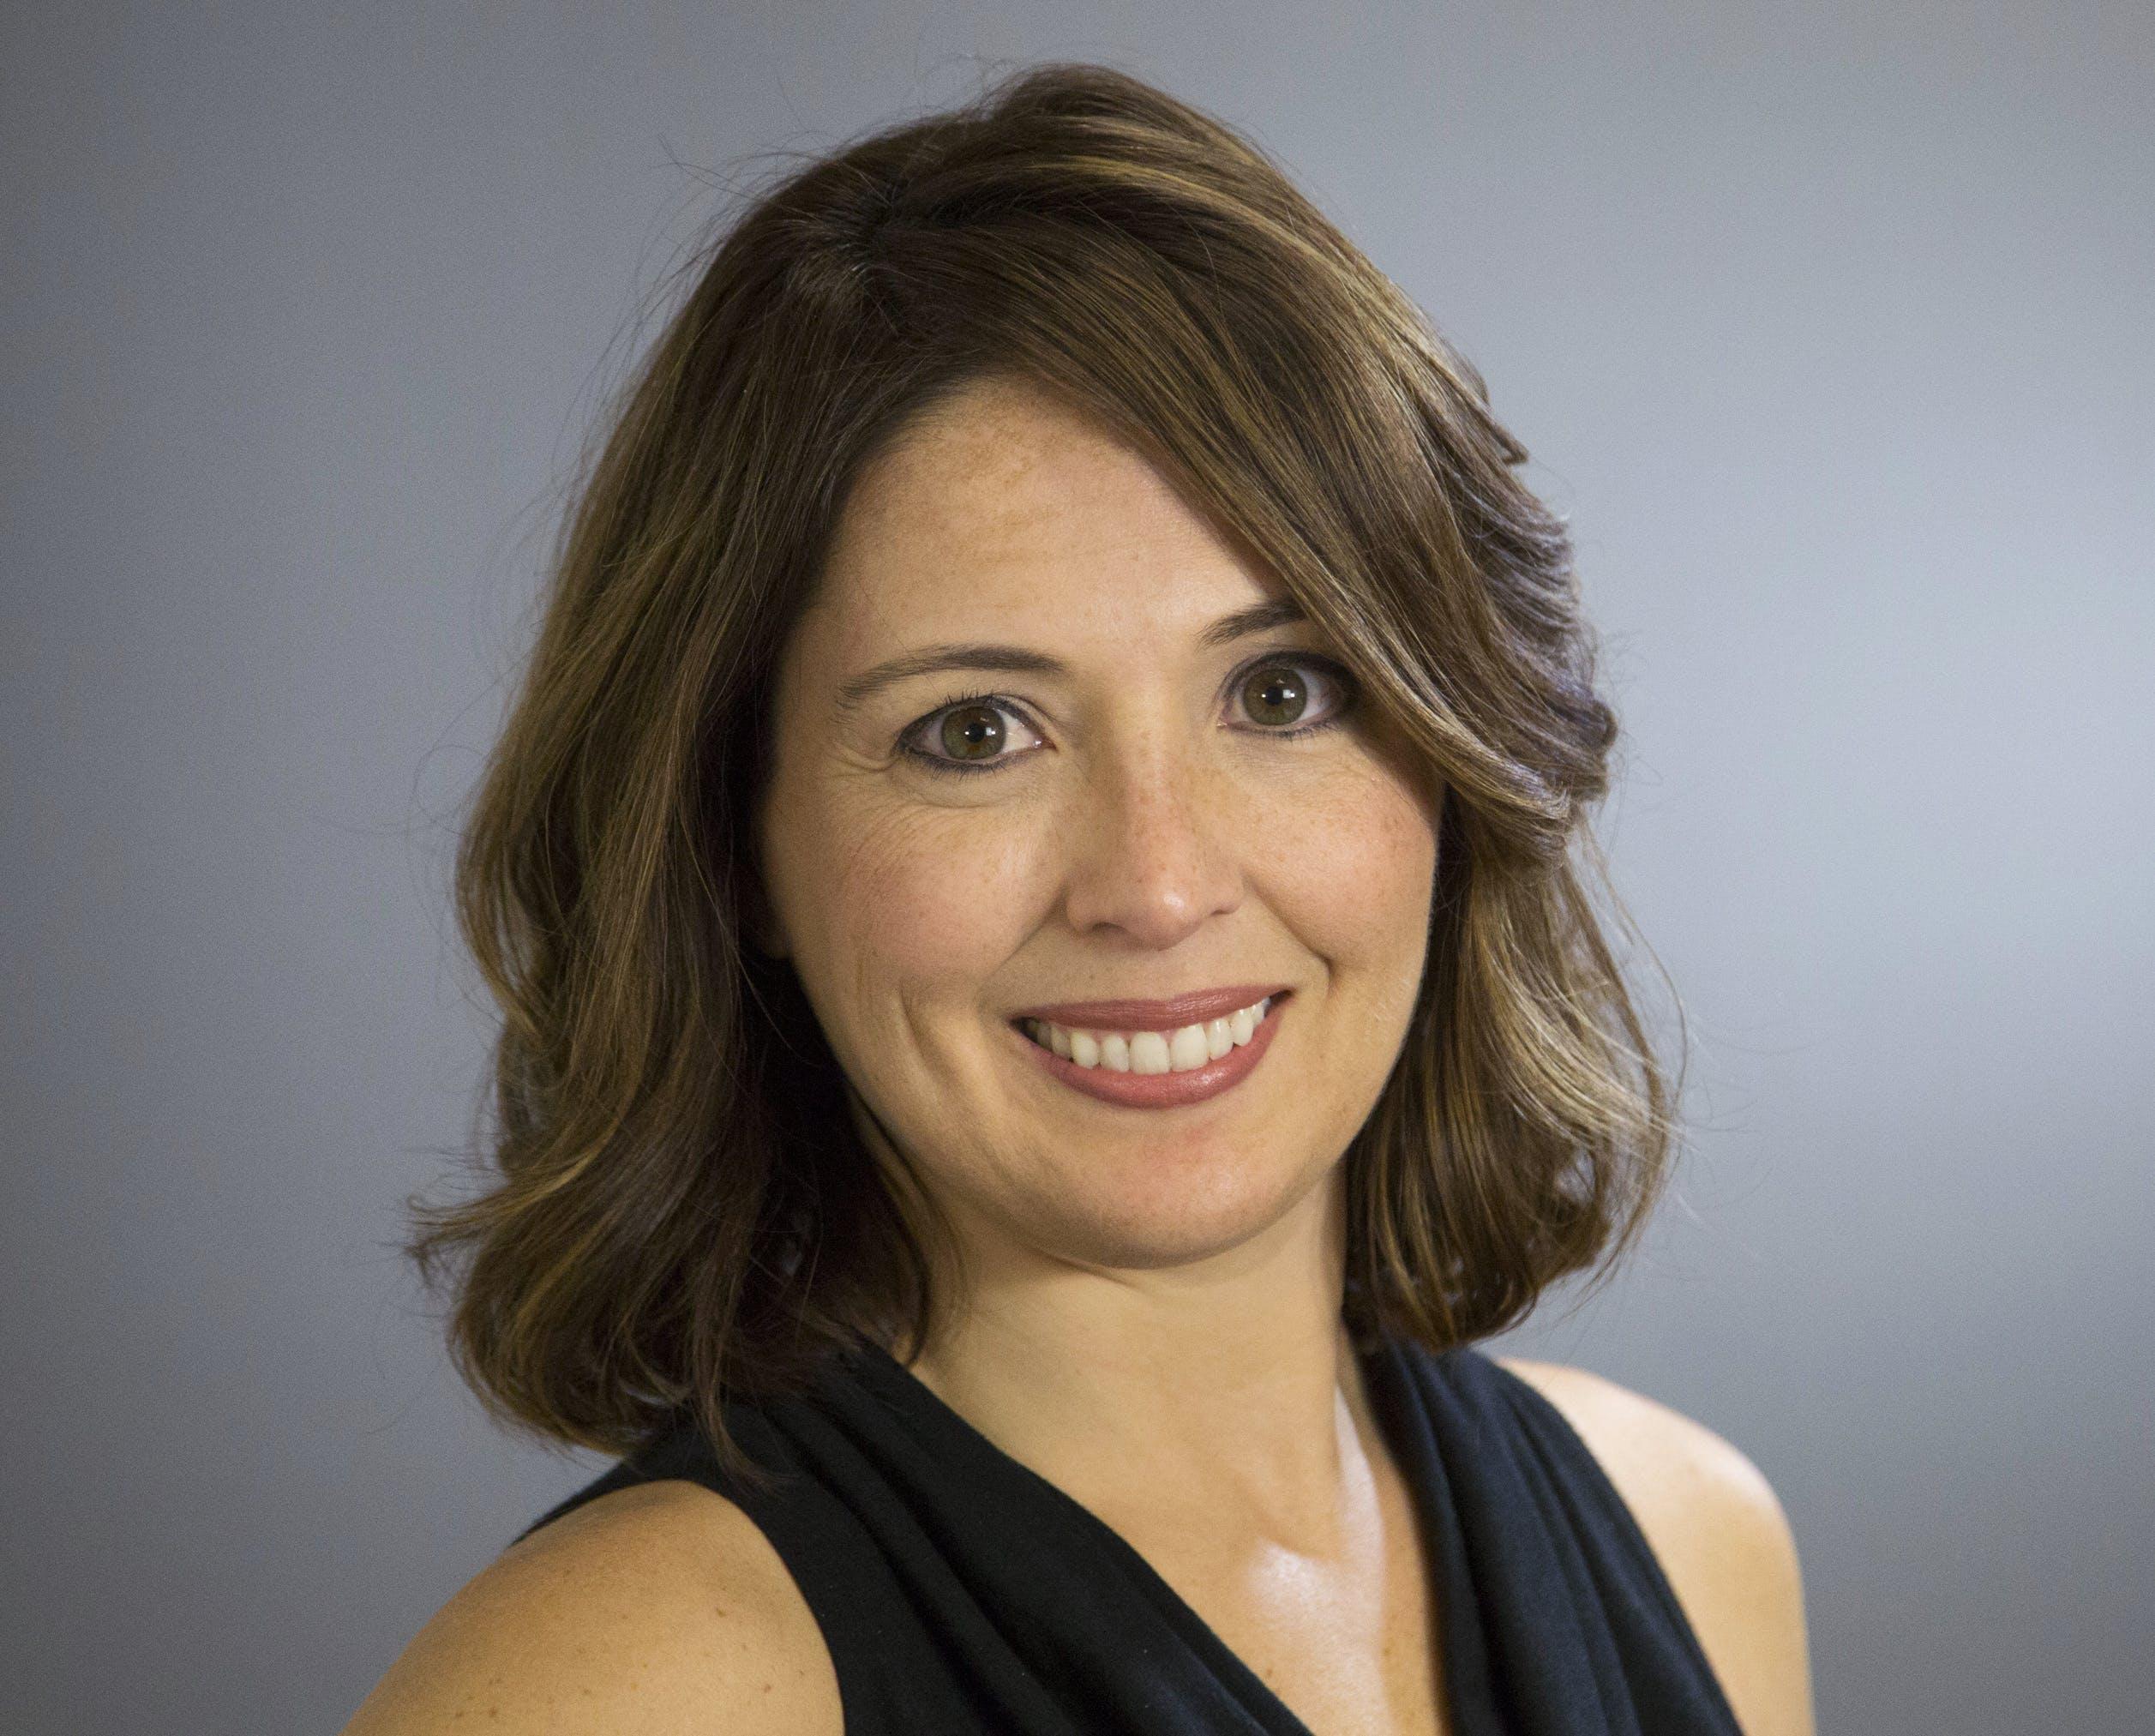 Victoria Roth O'Neal